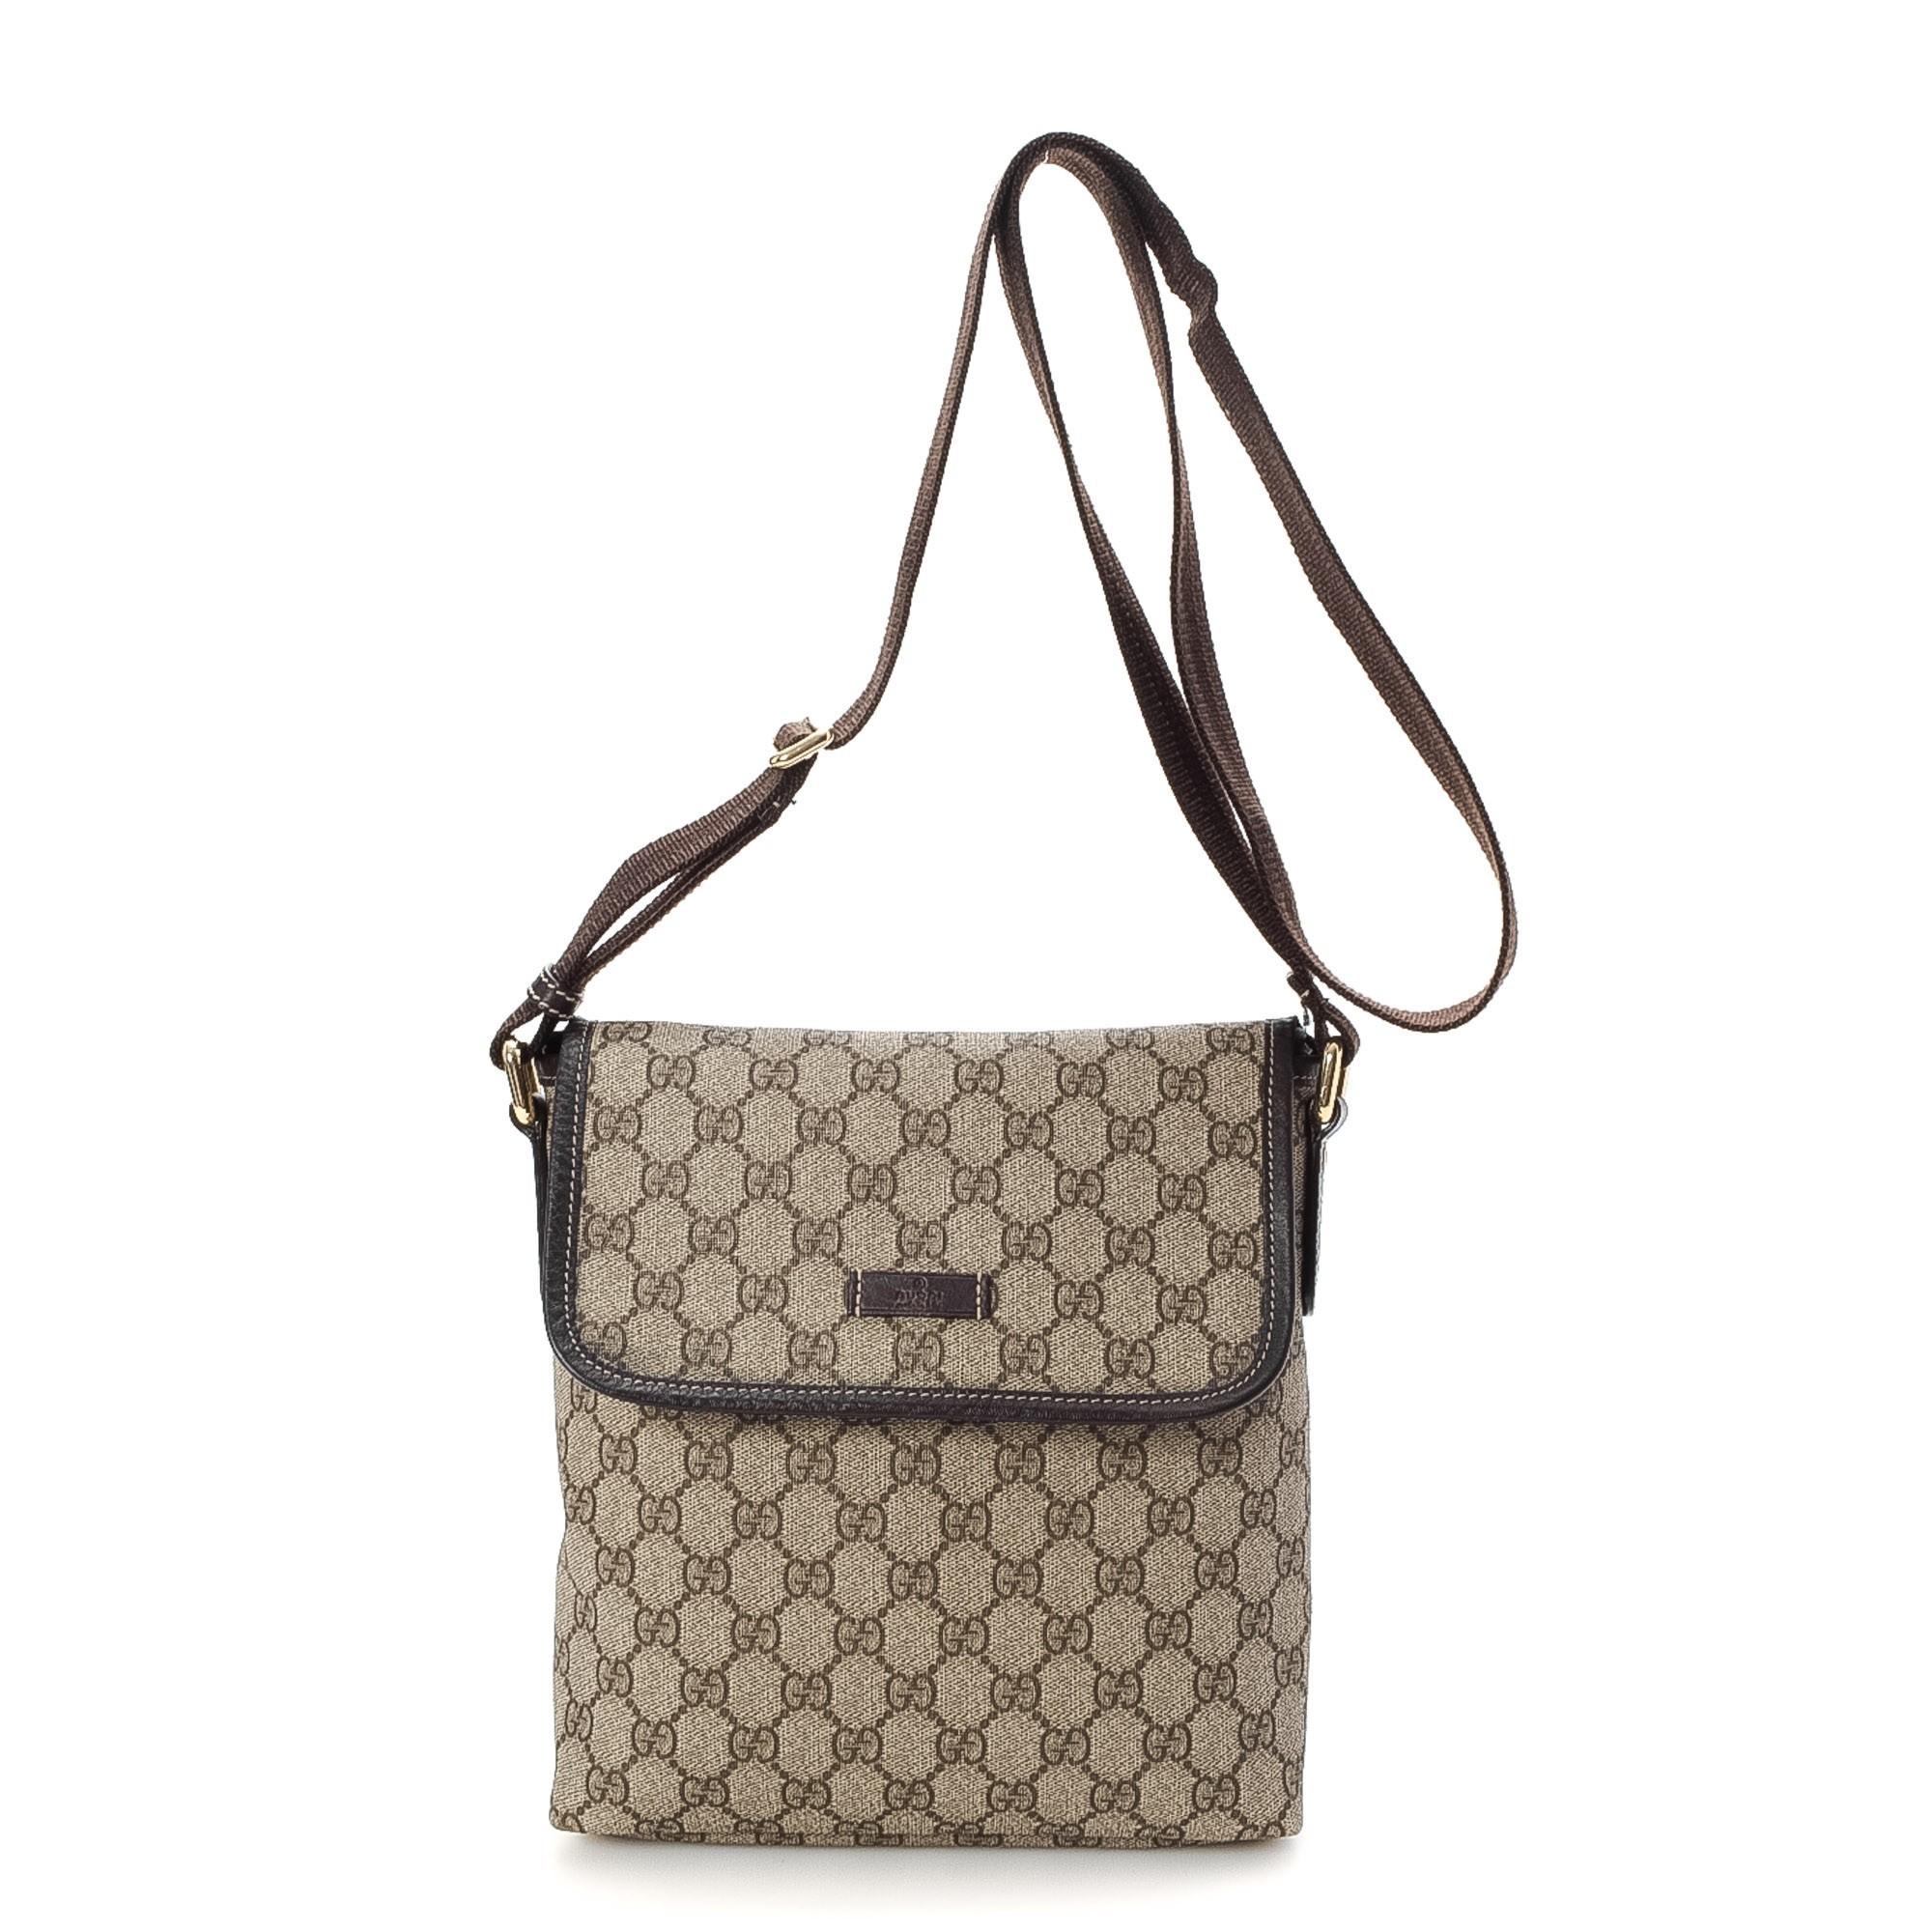 ba442a4dbecc Gucci Messenger Crossbody Handbags. NEW Authentic GUCCI GG Canvas Crossbody  Sling Bag ...